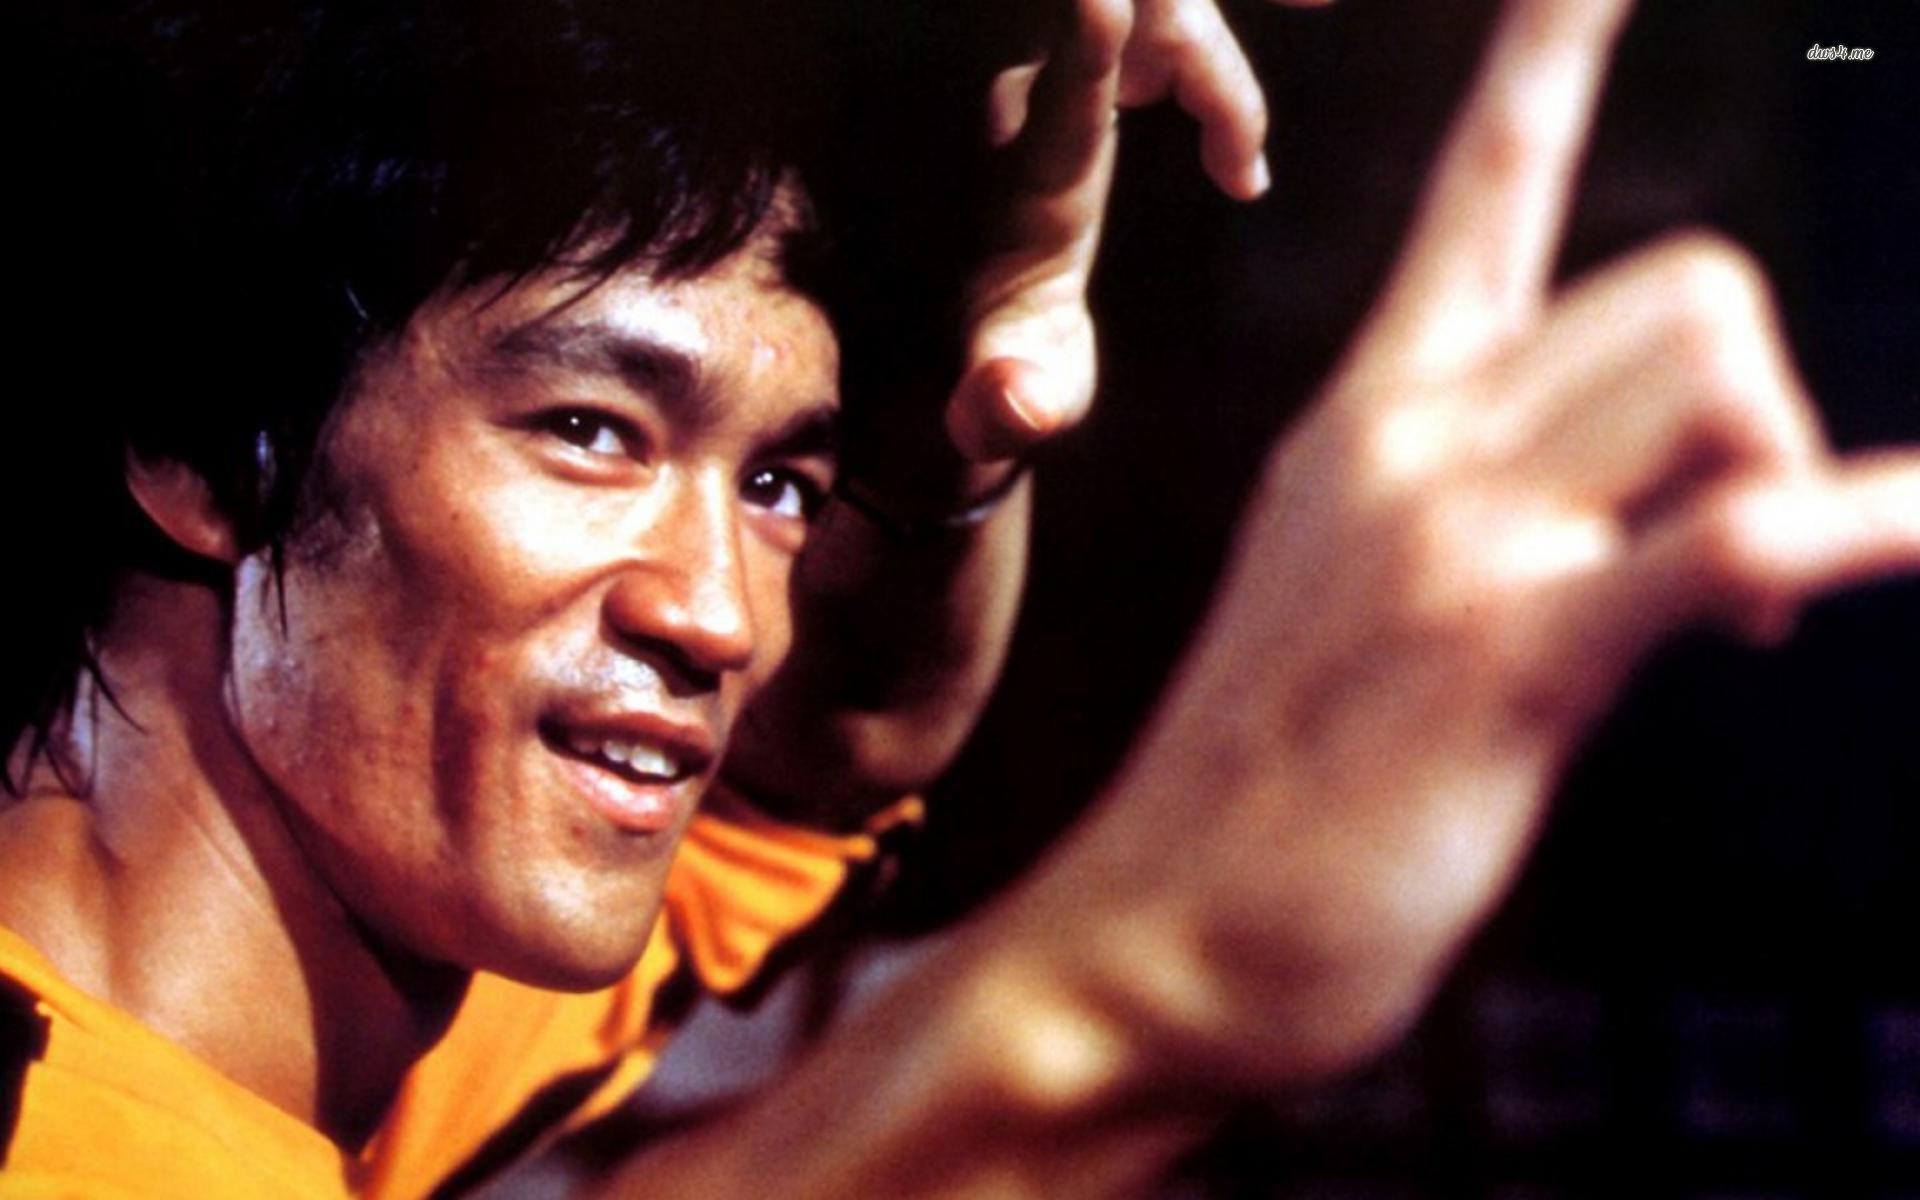 Bruce Lee networkokulu.net motivasyon sözleri 5